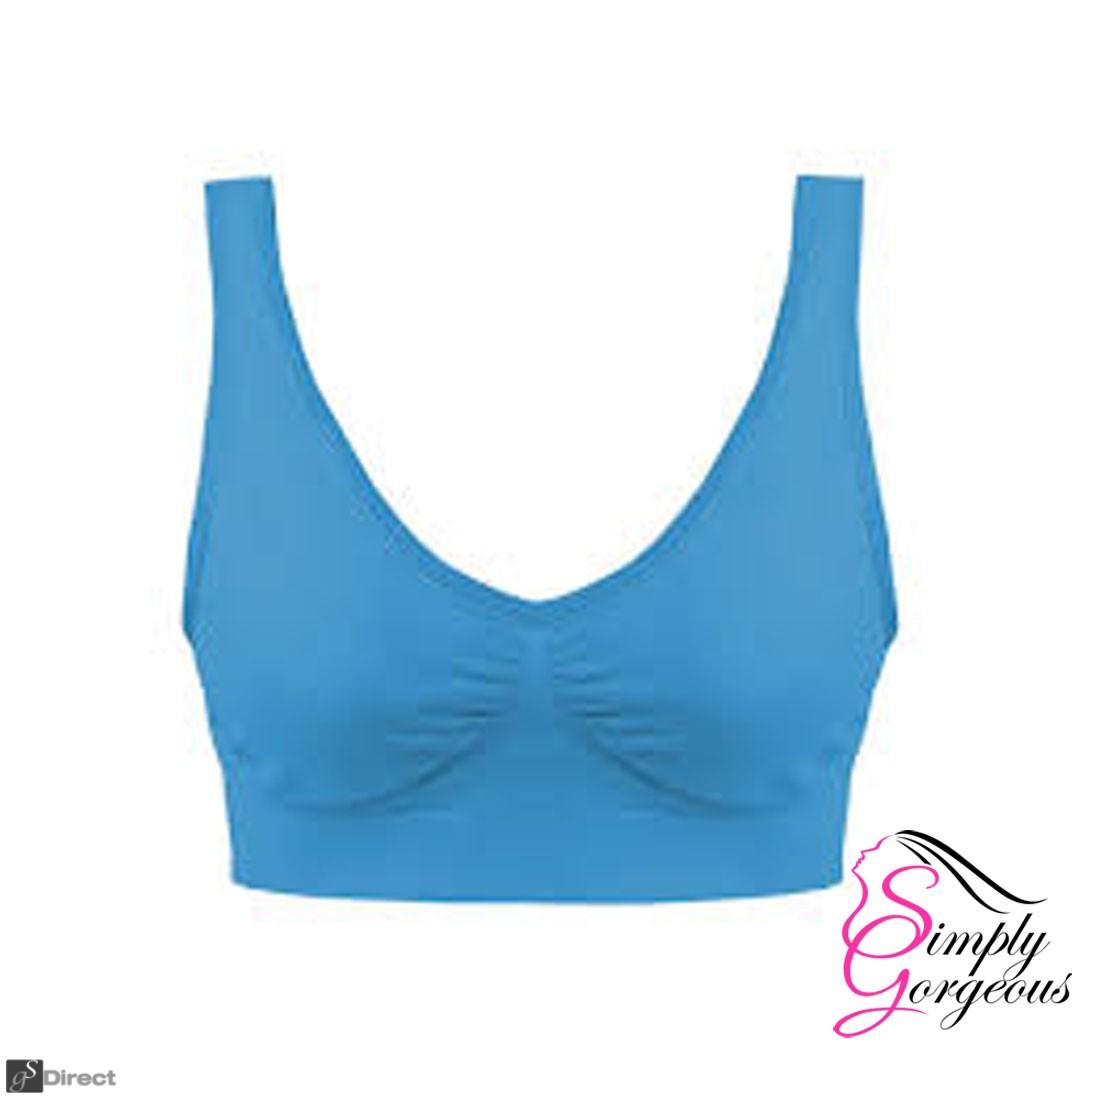 Simply Gorgeous Ultra Comfort Seamless Sport Style Bra - Blue - XL